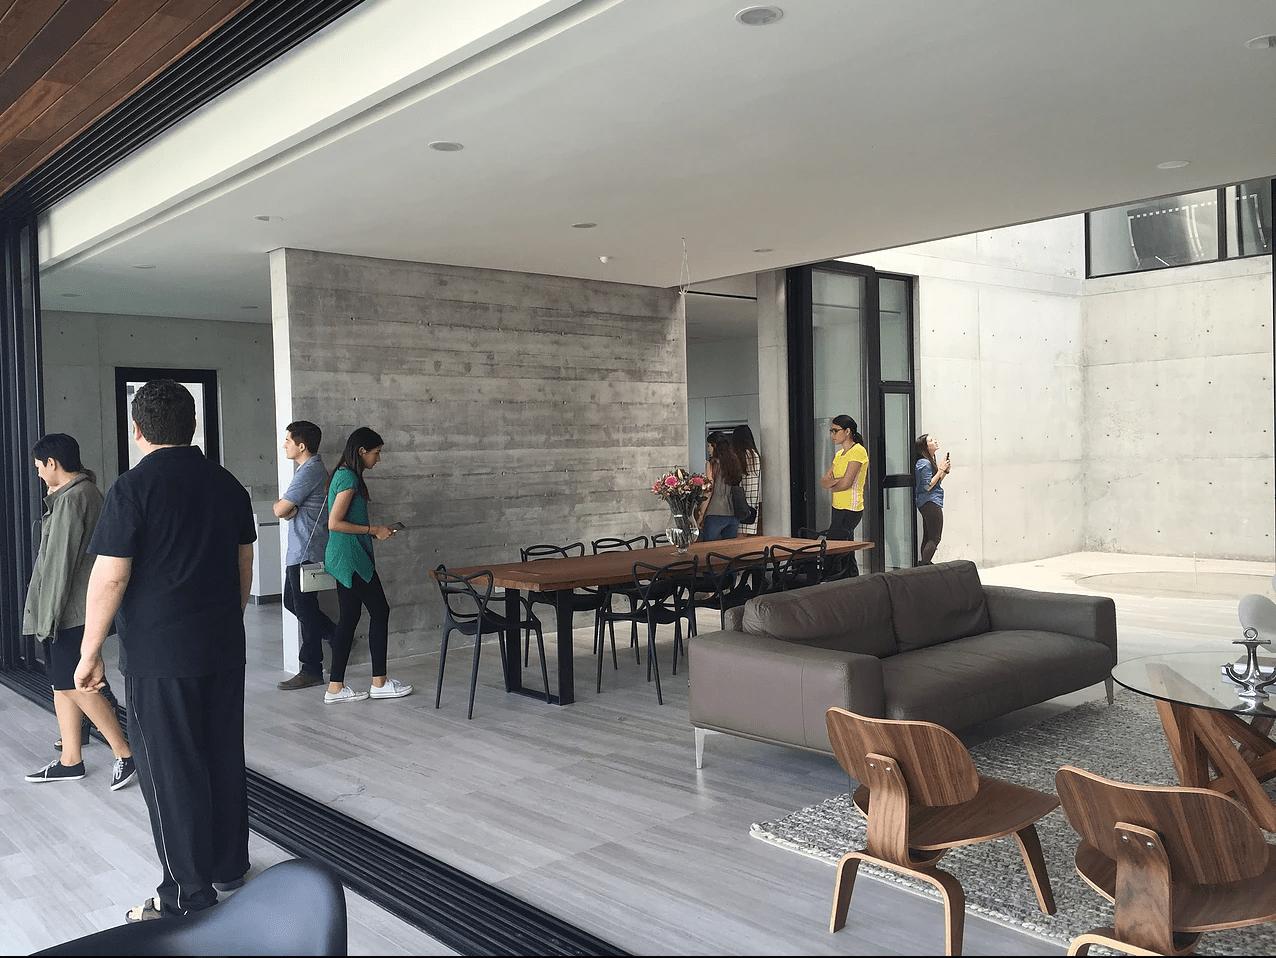 Open House Monterrey llegará en abril de 2017